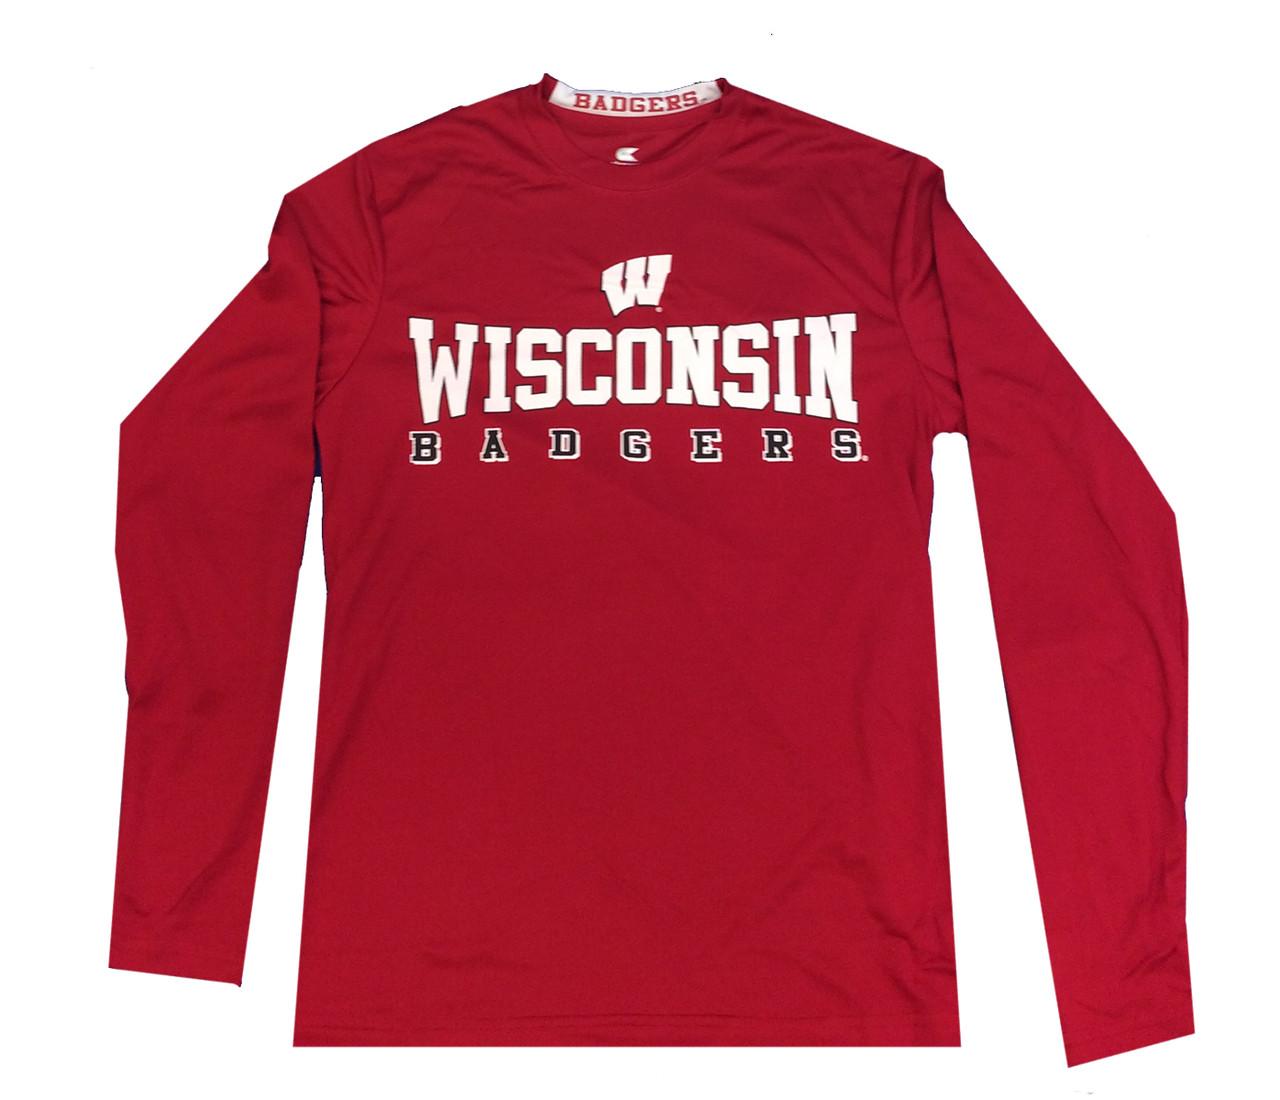 b507d593f0ae Colosseum Wisconsin Badgers Mens Streamer Long Sleeve T-shirt - Trenz Shirt  Company